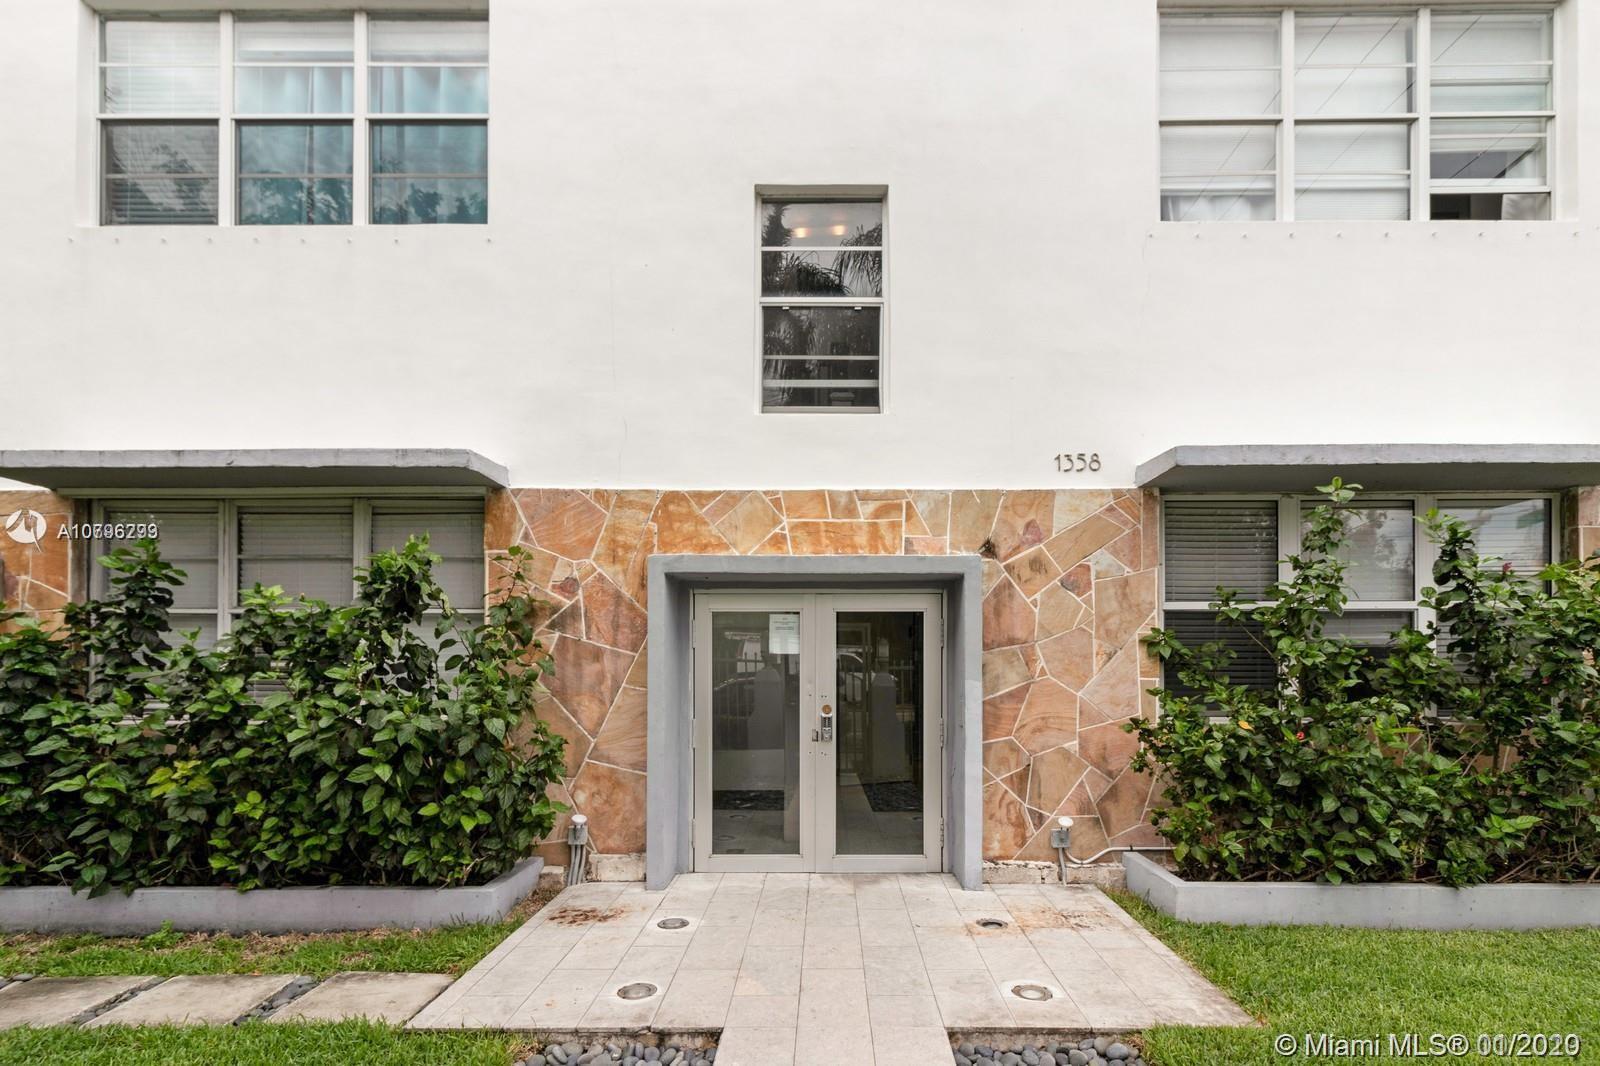 1358 Pennsylvania Ave # 302, Miami Beach, Florida 33139, 1 Bedroom Bedrooms, ,1 BathroomBathrooms,Residential,For Sale,1358 Pennsylvania Ave # 302,A10796293